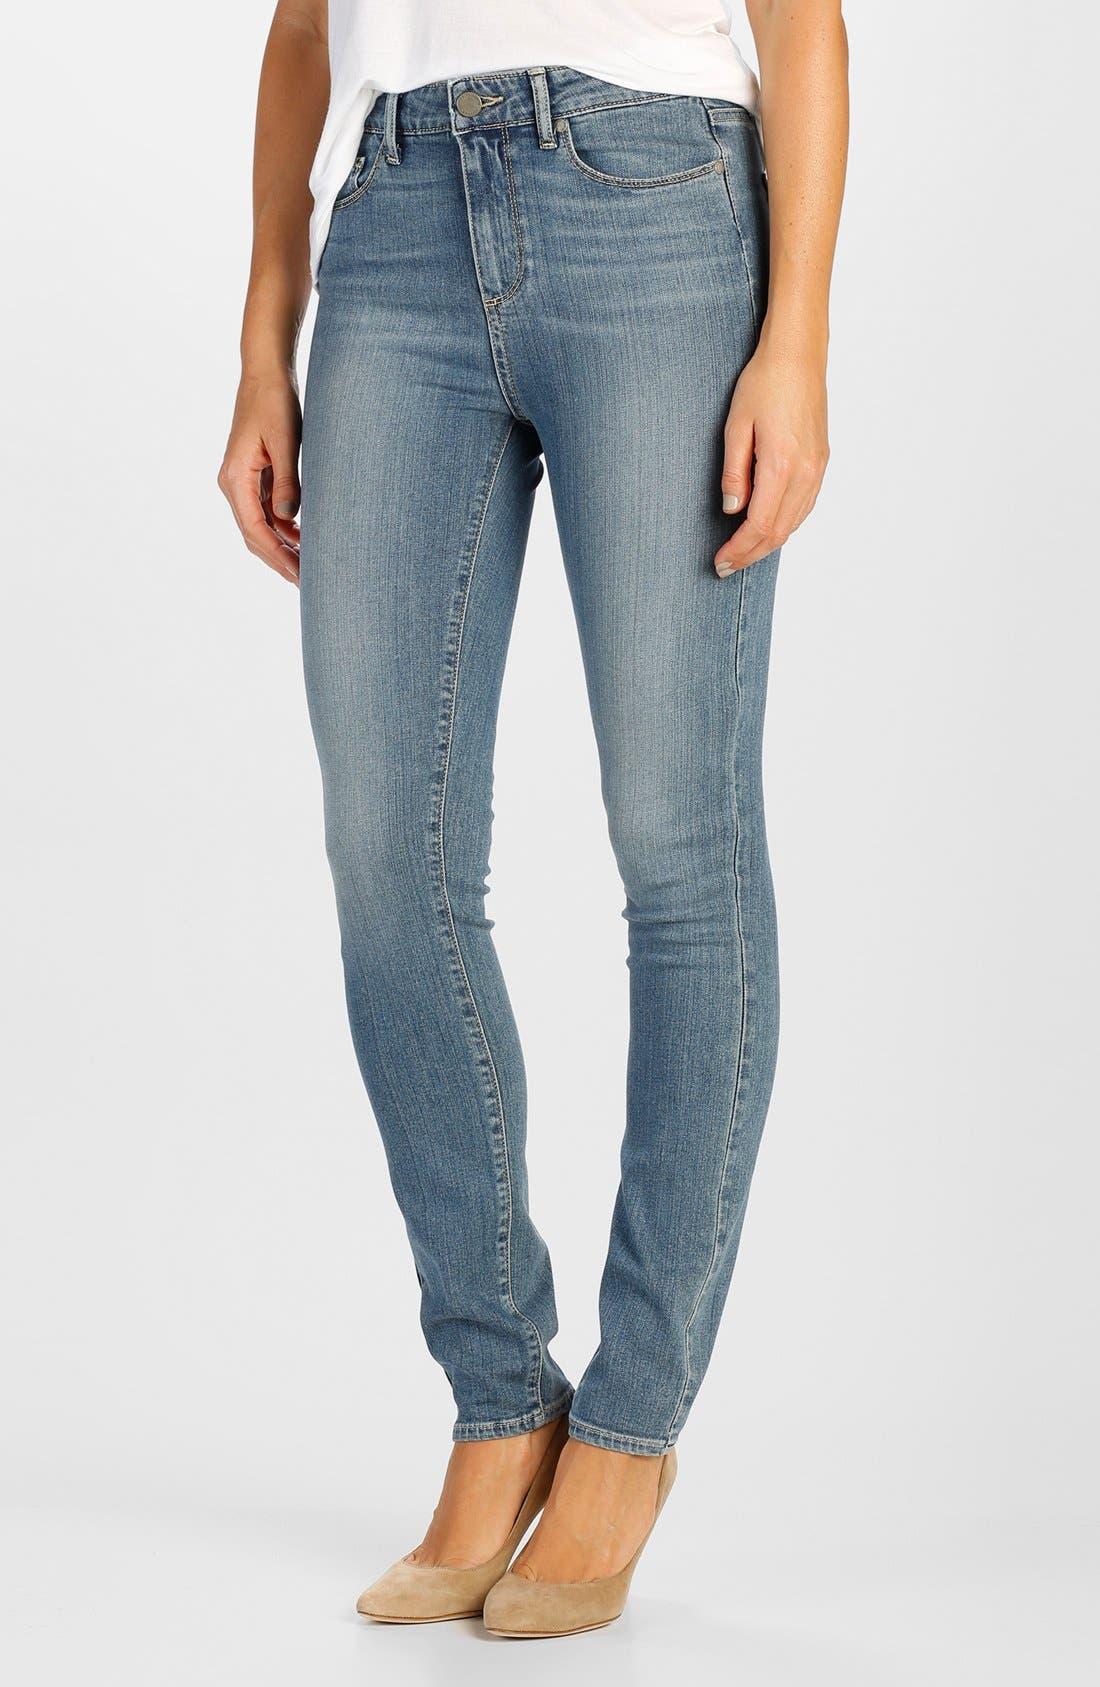 Main Image - Paige Denim 'Transcend - Hoxton' High Rise Ultra Skinny Jeans (Teagan)